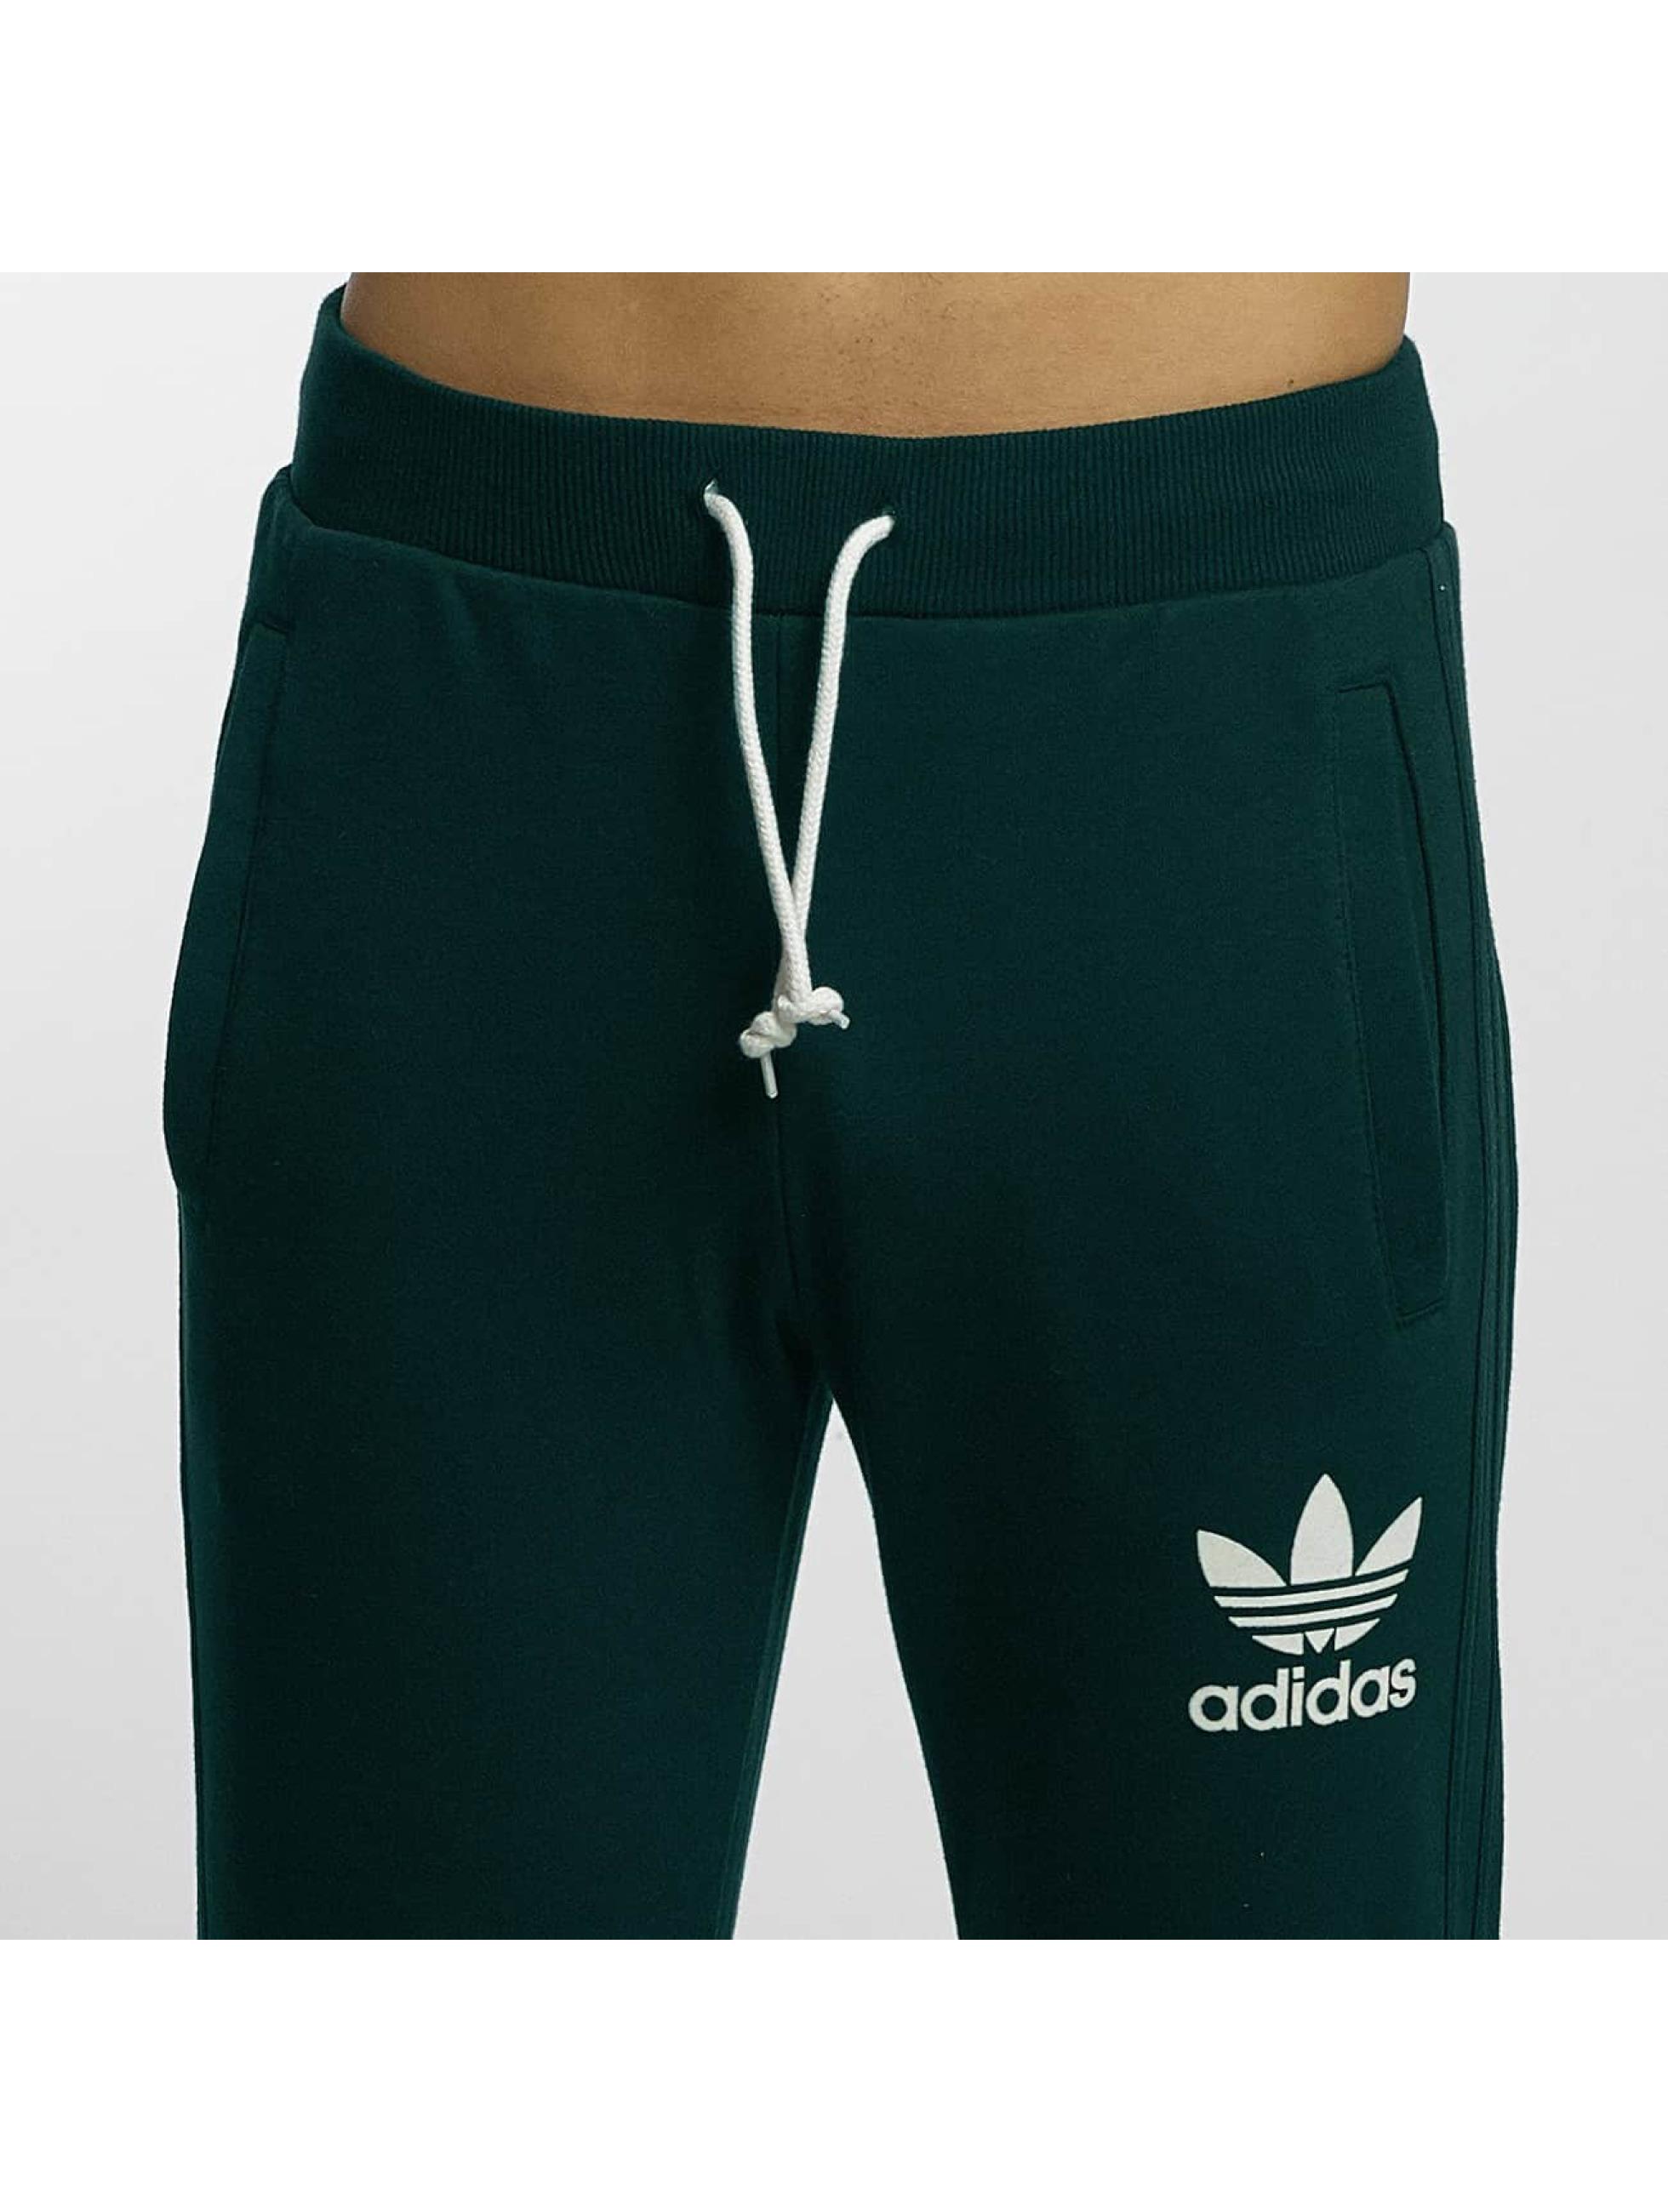 adidas Sweat Pant 3 Striped green